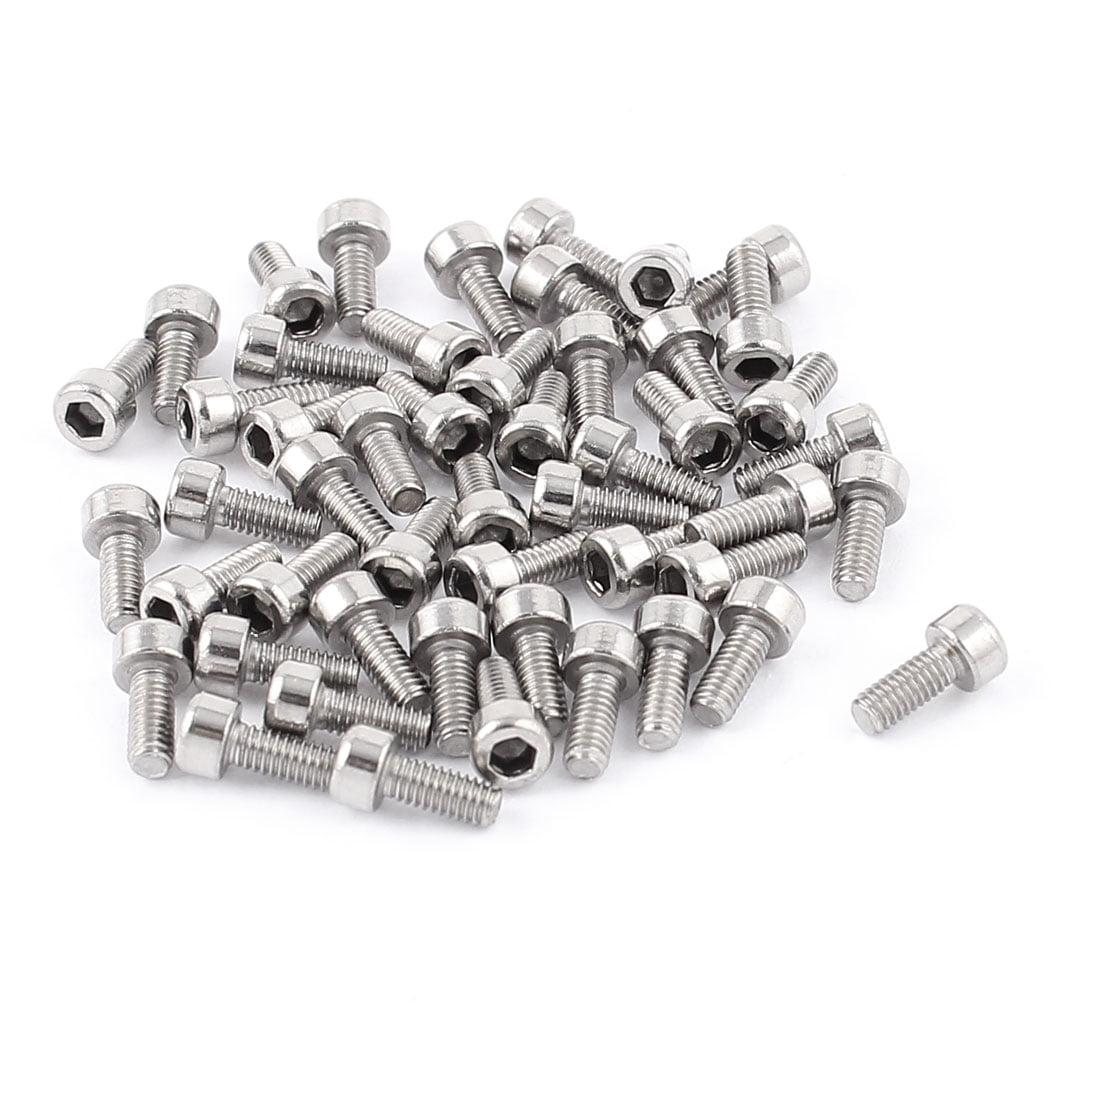 50 Pcs M2.5 x 6mm Metal Hex Socket Head Cap Screws Stainless Fully Thread - image 1 of 1